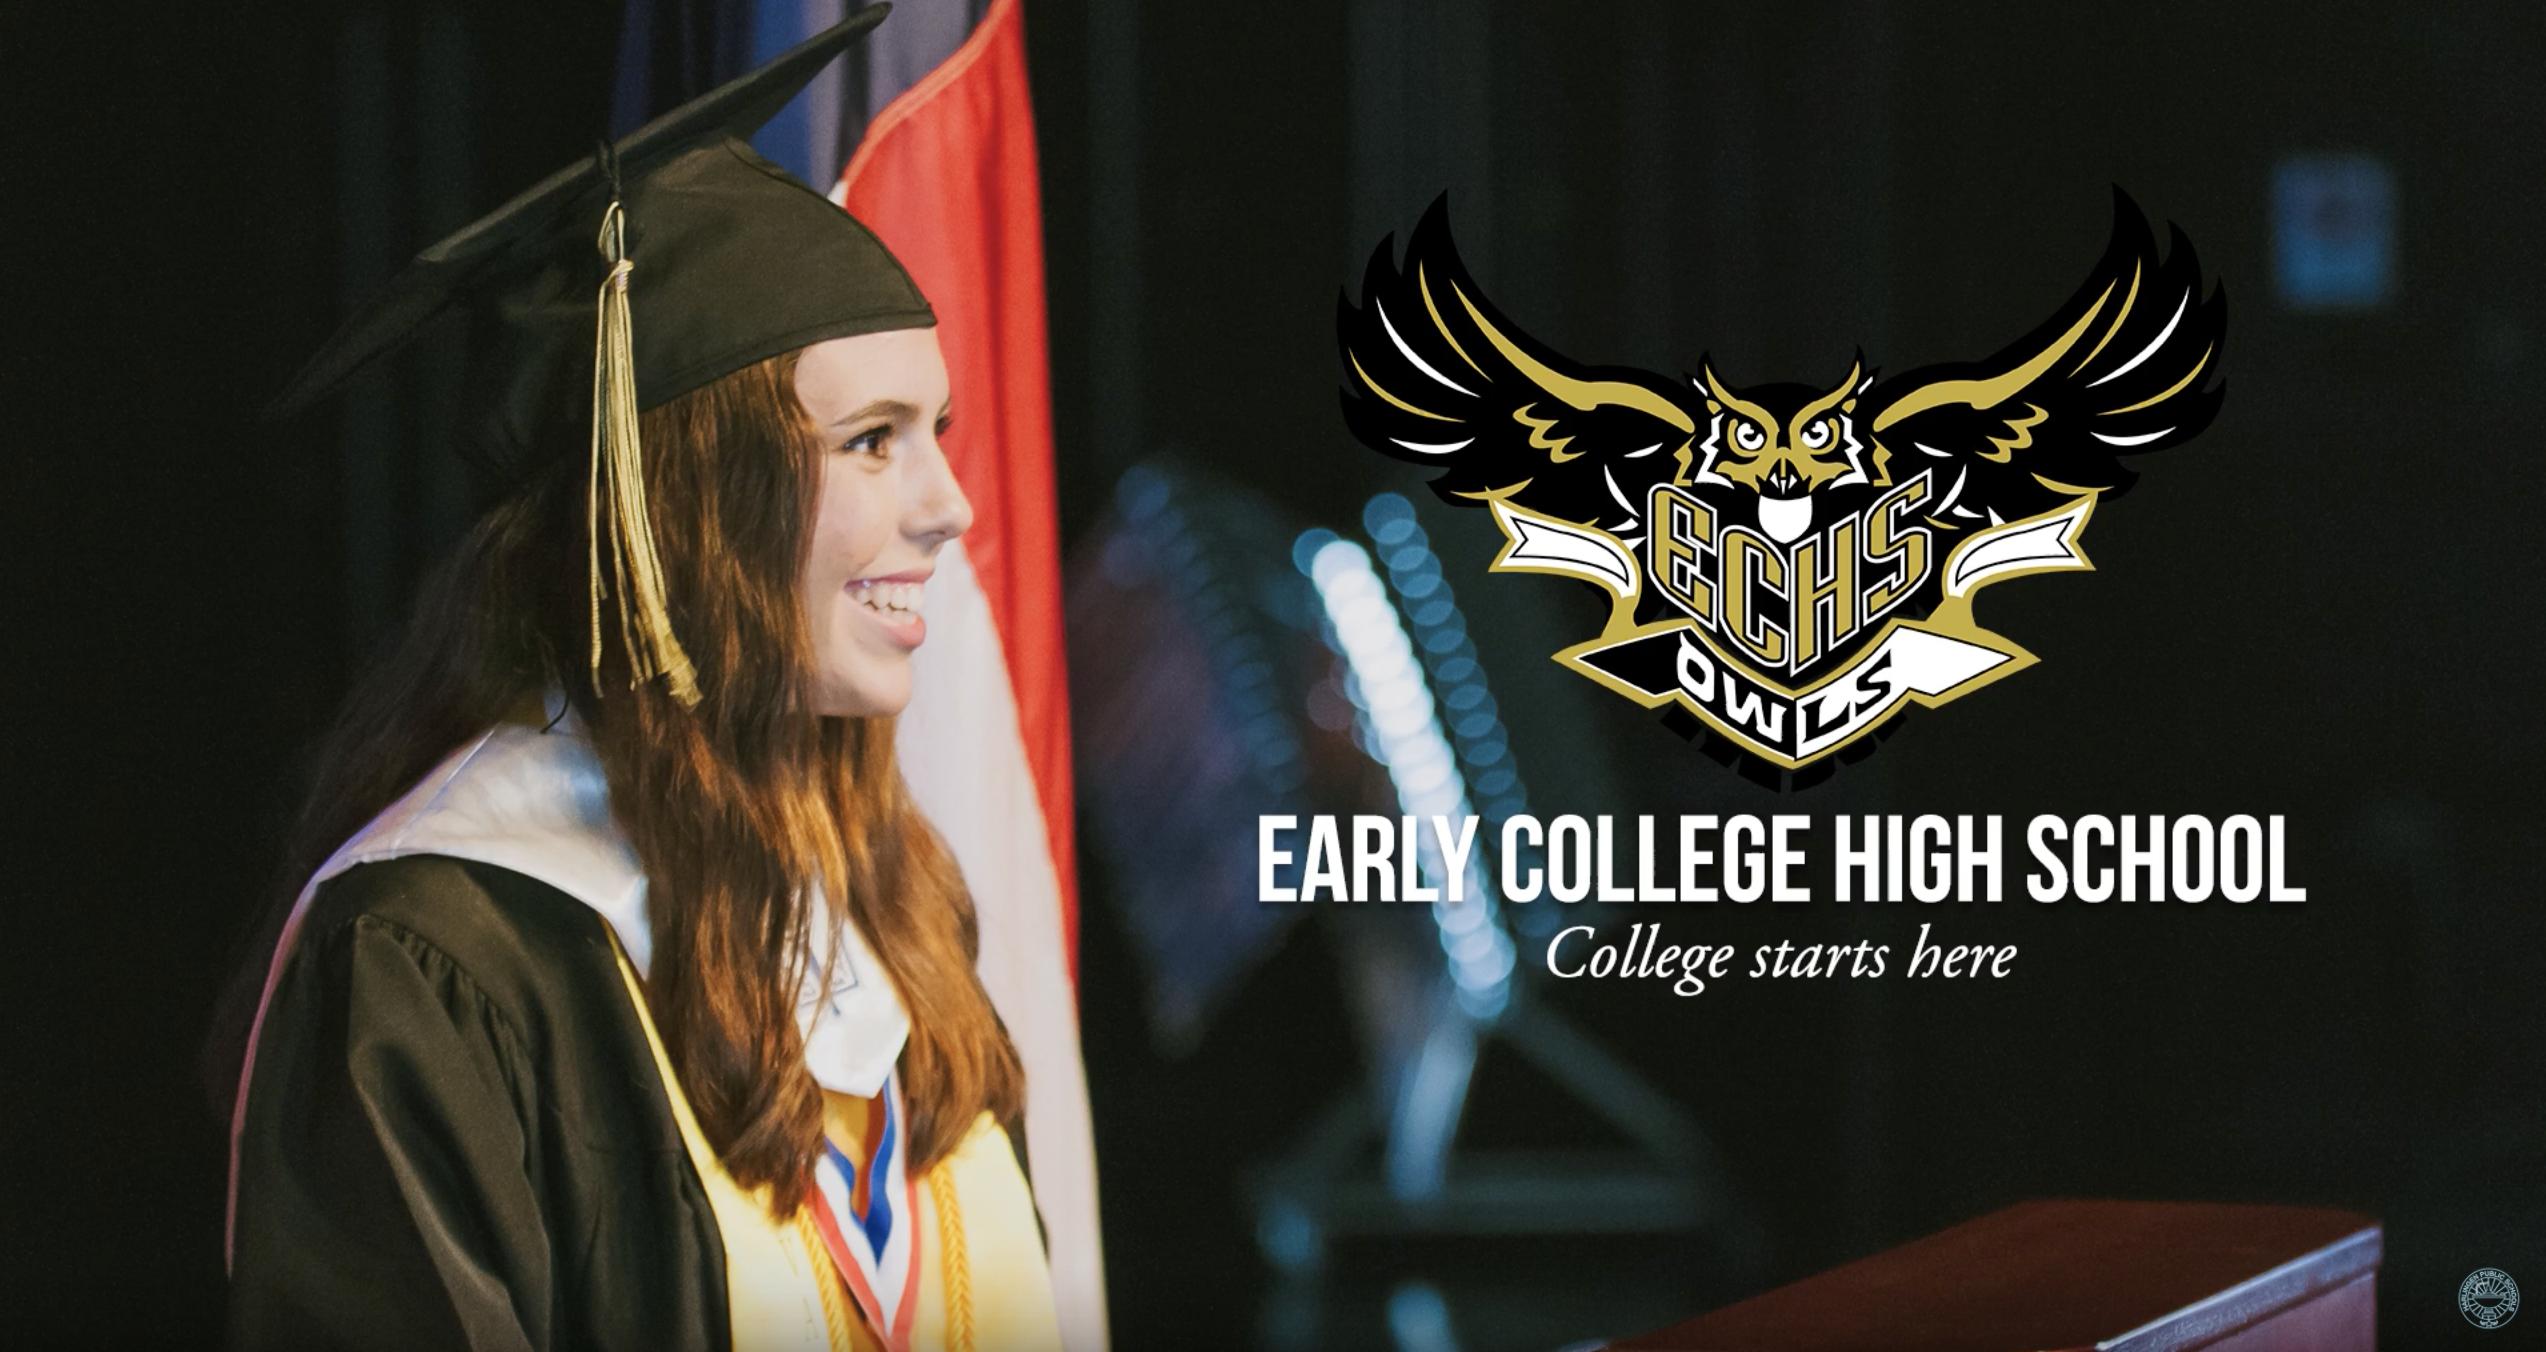 HCISD celebrates Early College High School Week